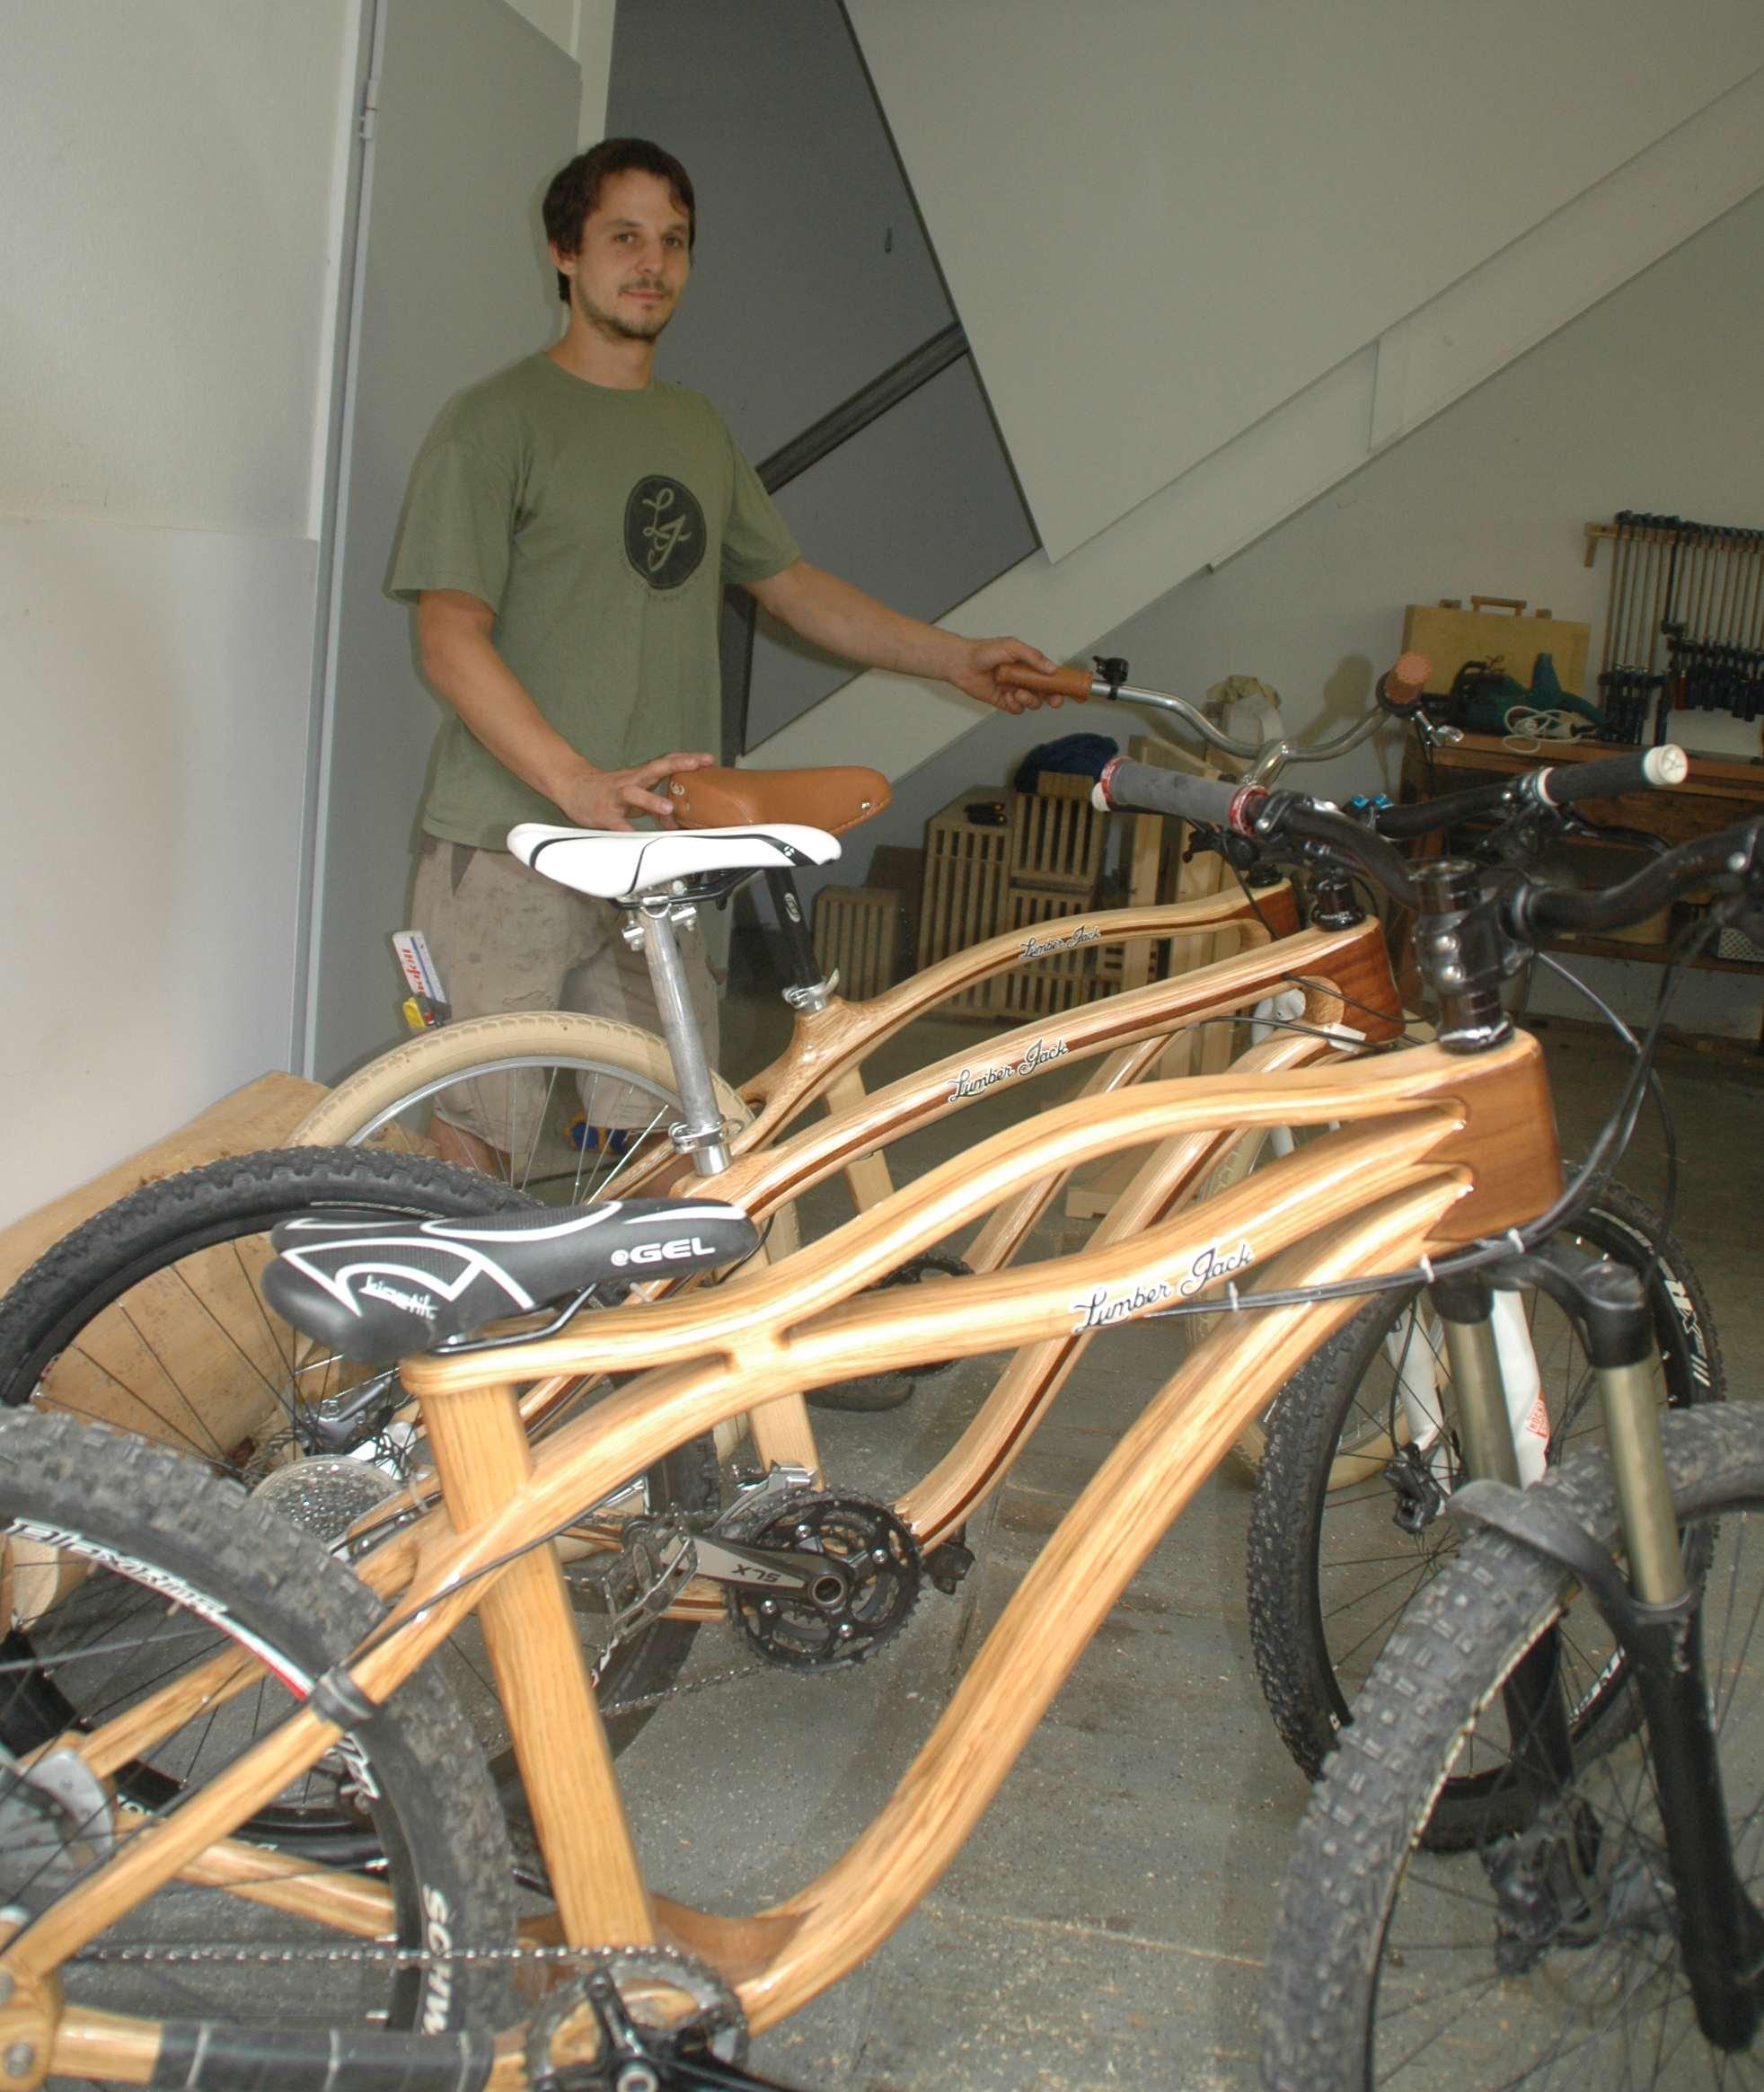 kinzigtal schramberg raphael much baut fahrradrahmen aus. Black Bedroom Furniture Sets. Home Design Ideas